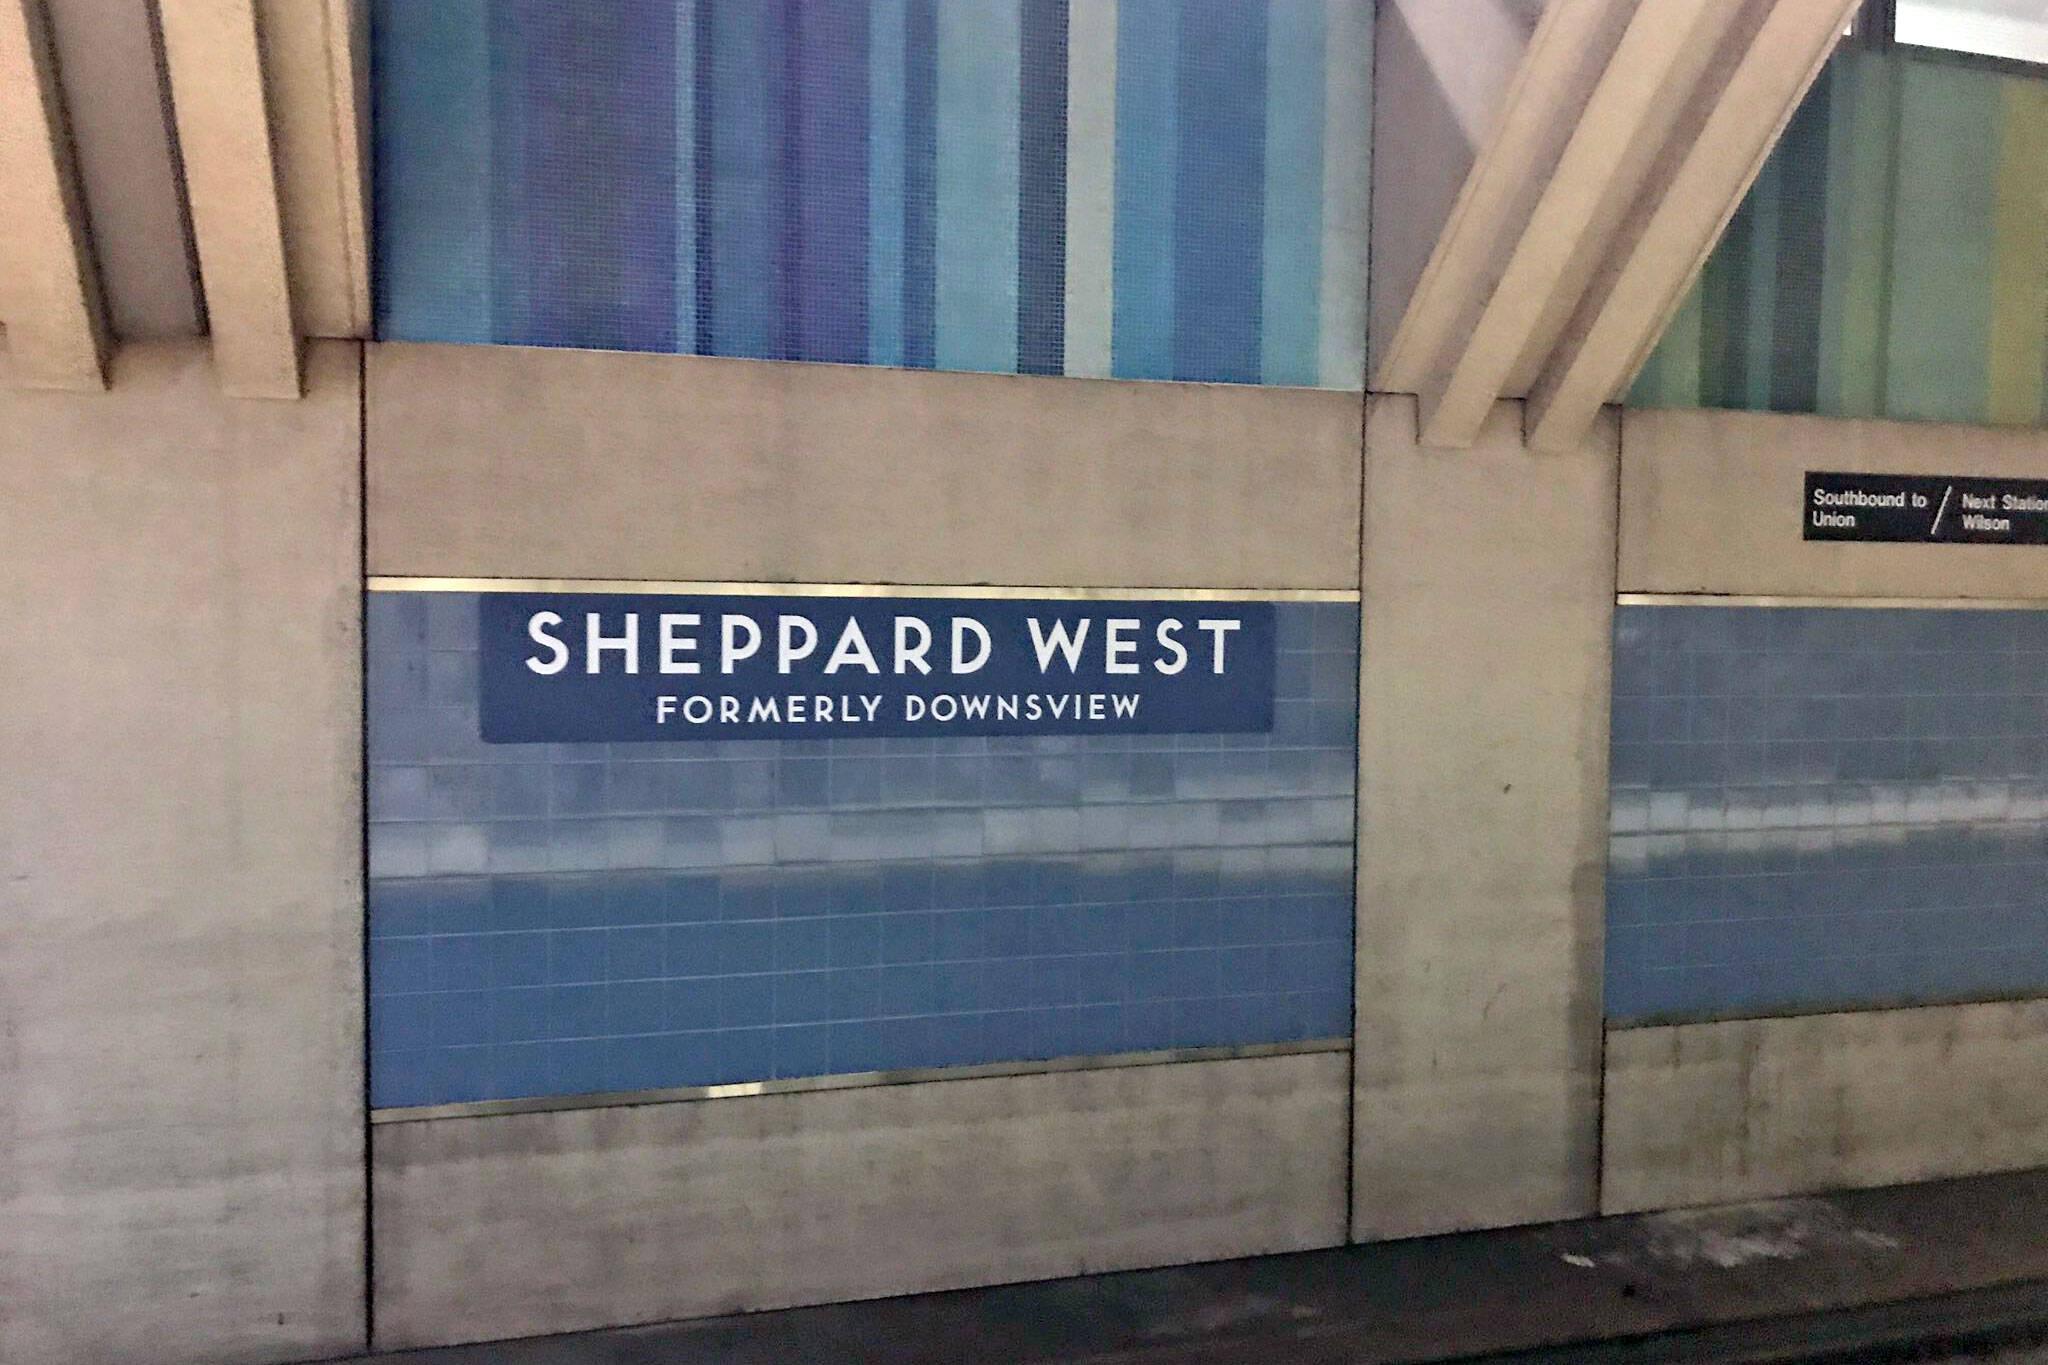 sheppard west